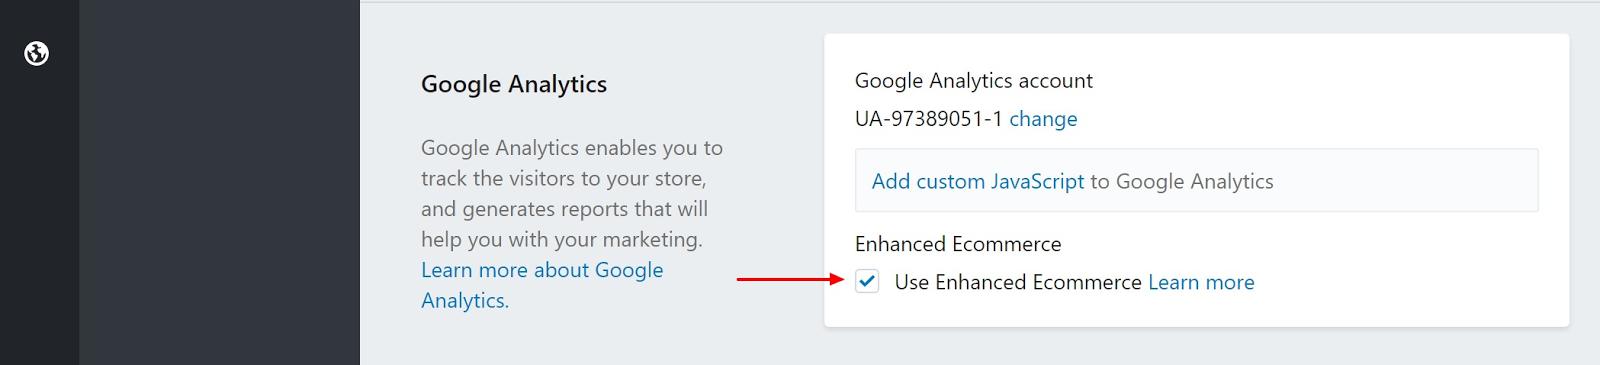 Guide] Setup Google Analytics Enhanced E-Commerce on Shopify